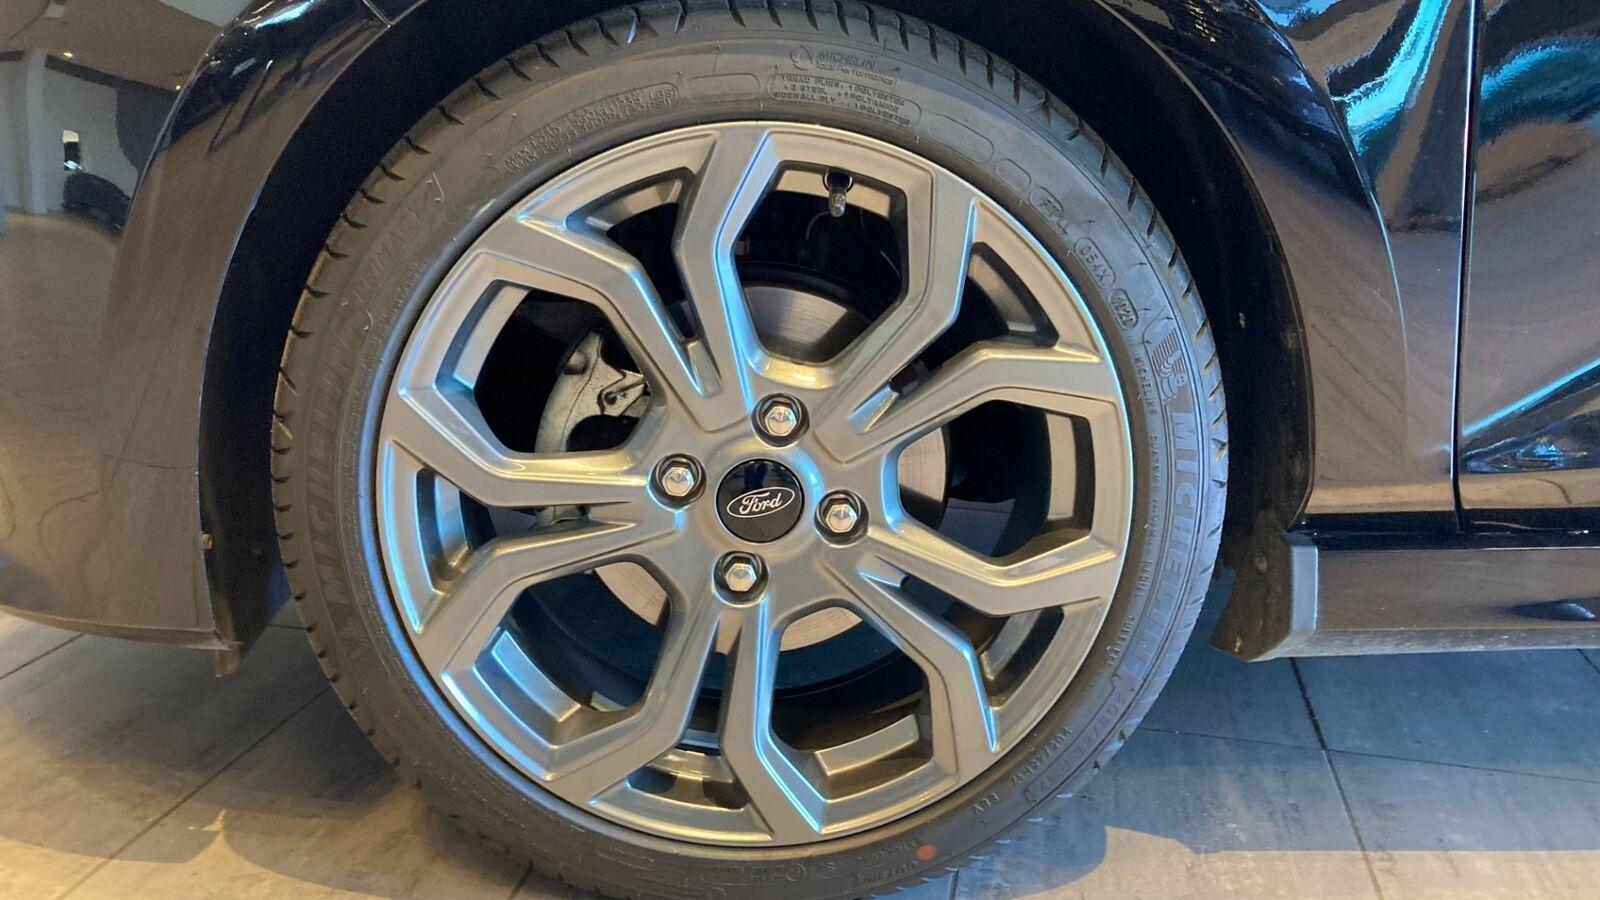 Ford Fiesta 1,5 TDCi 85 ST-Line X - billede 6